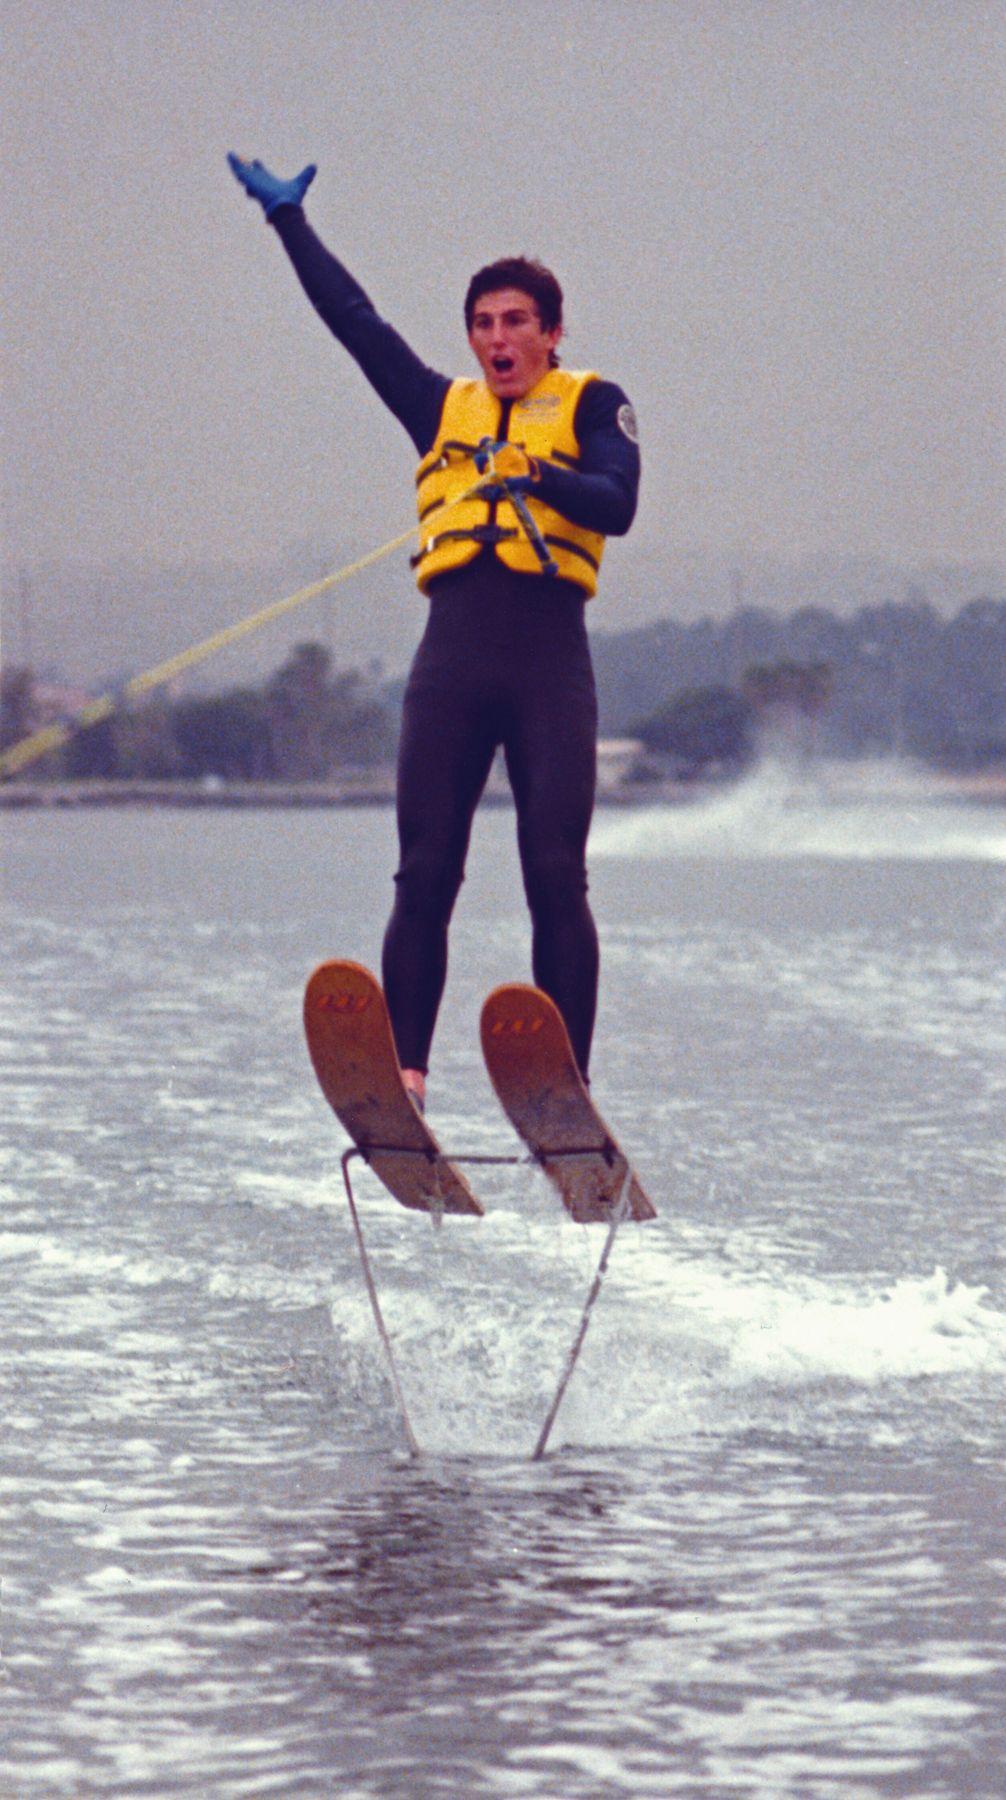 Free Water Ski Photos HYDROFOIL STANDUP Water skiing